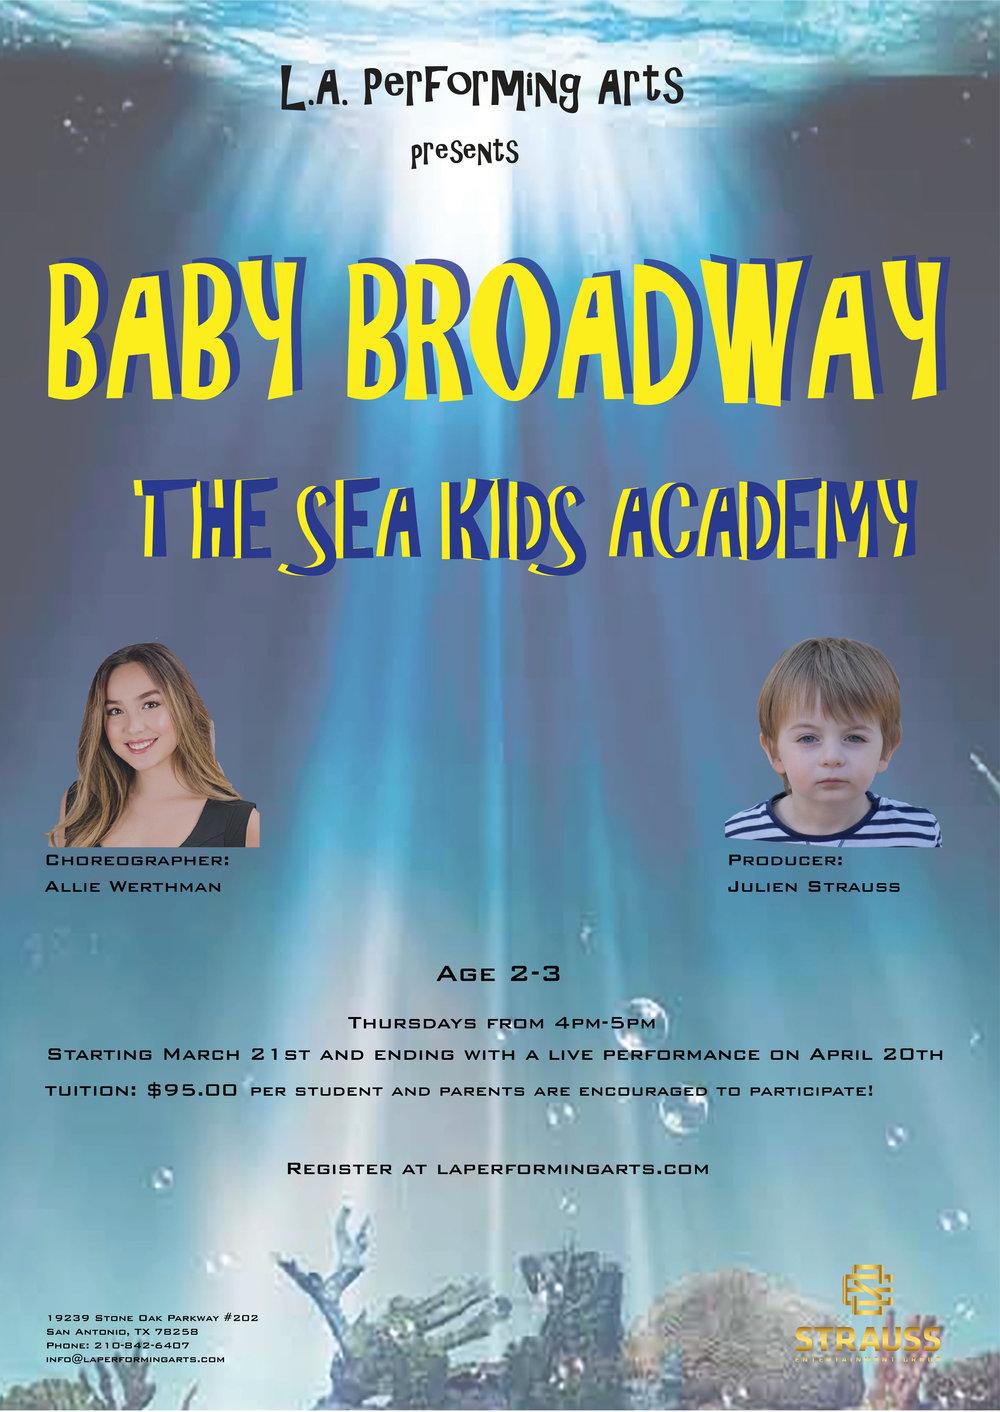 baby broadway.jpg